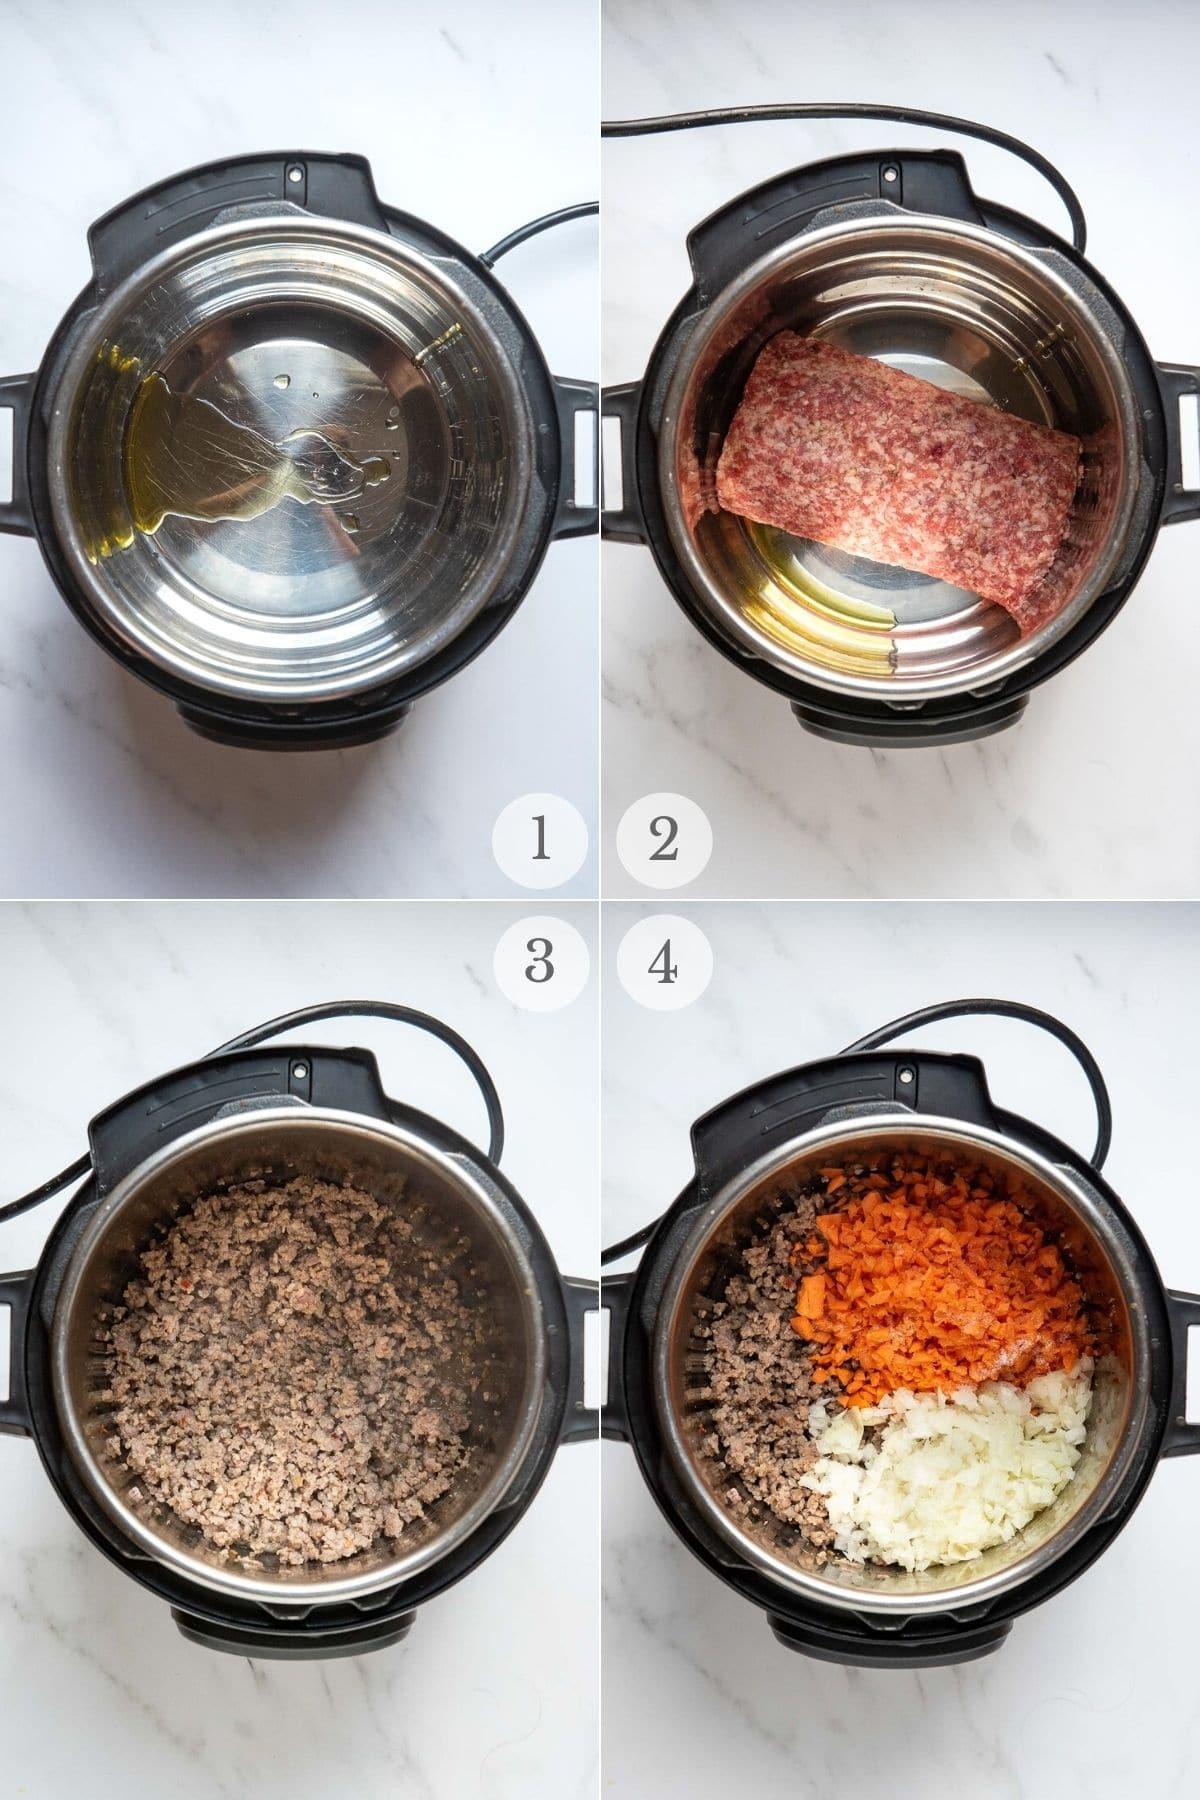 pasta e fagioli recipe steps 1-4